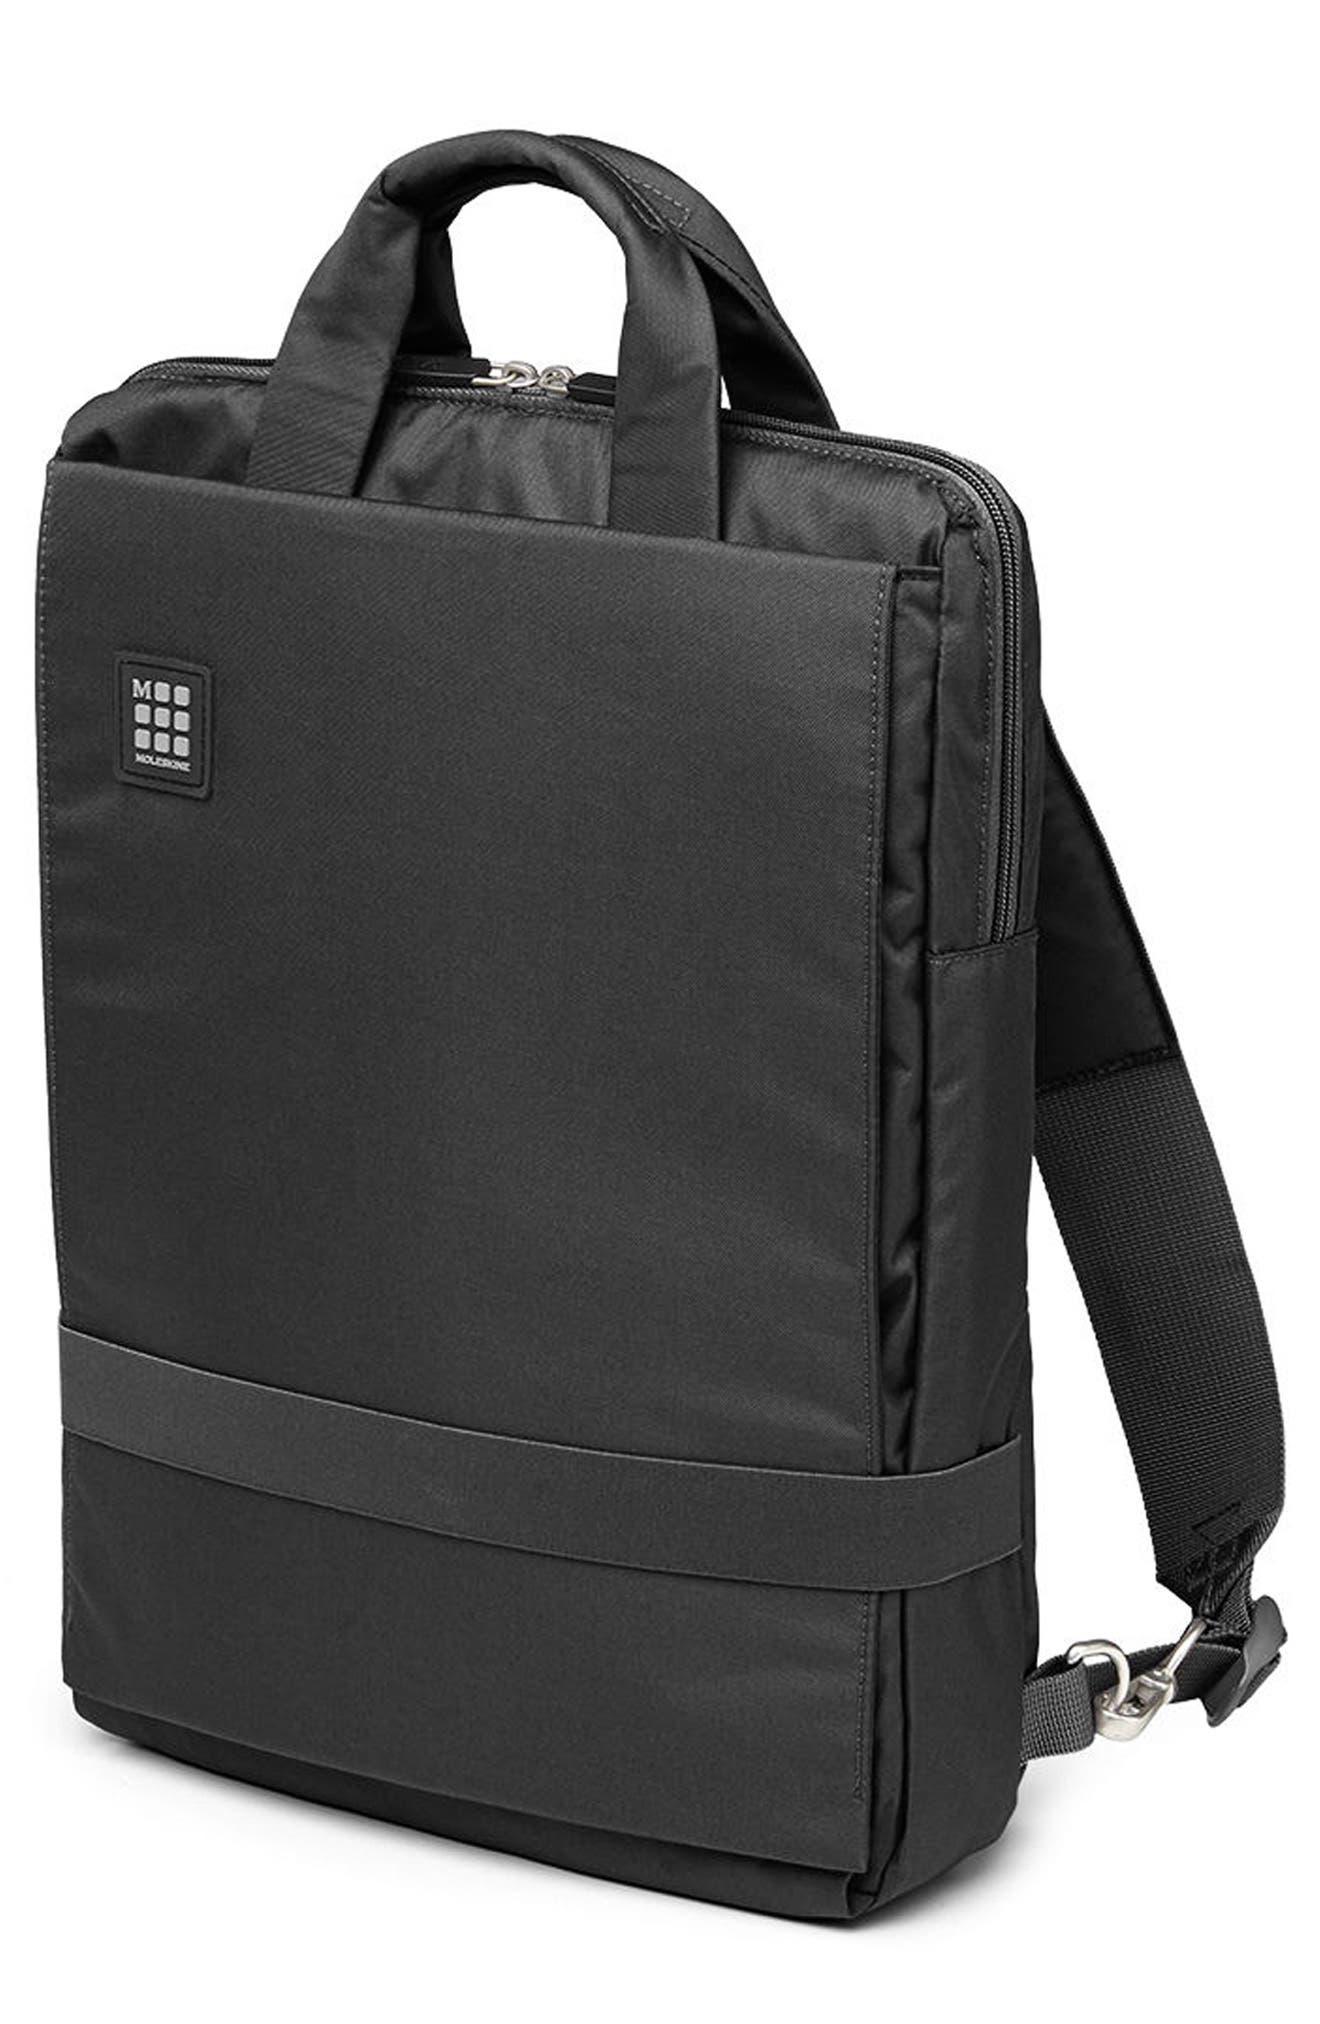 Vertical Device Bag,                             Main thumbnail 1, color,                             001